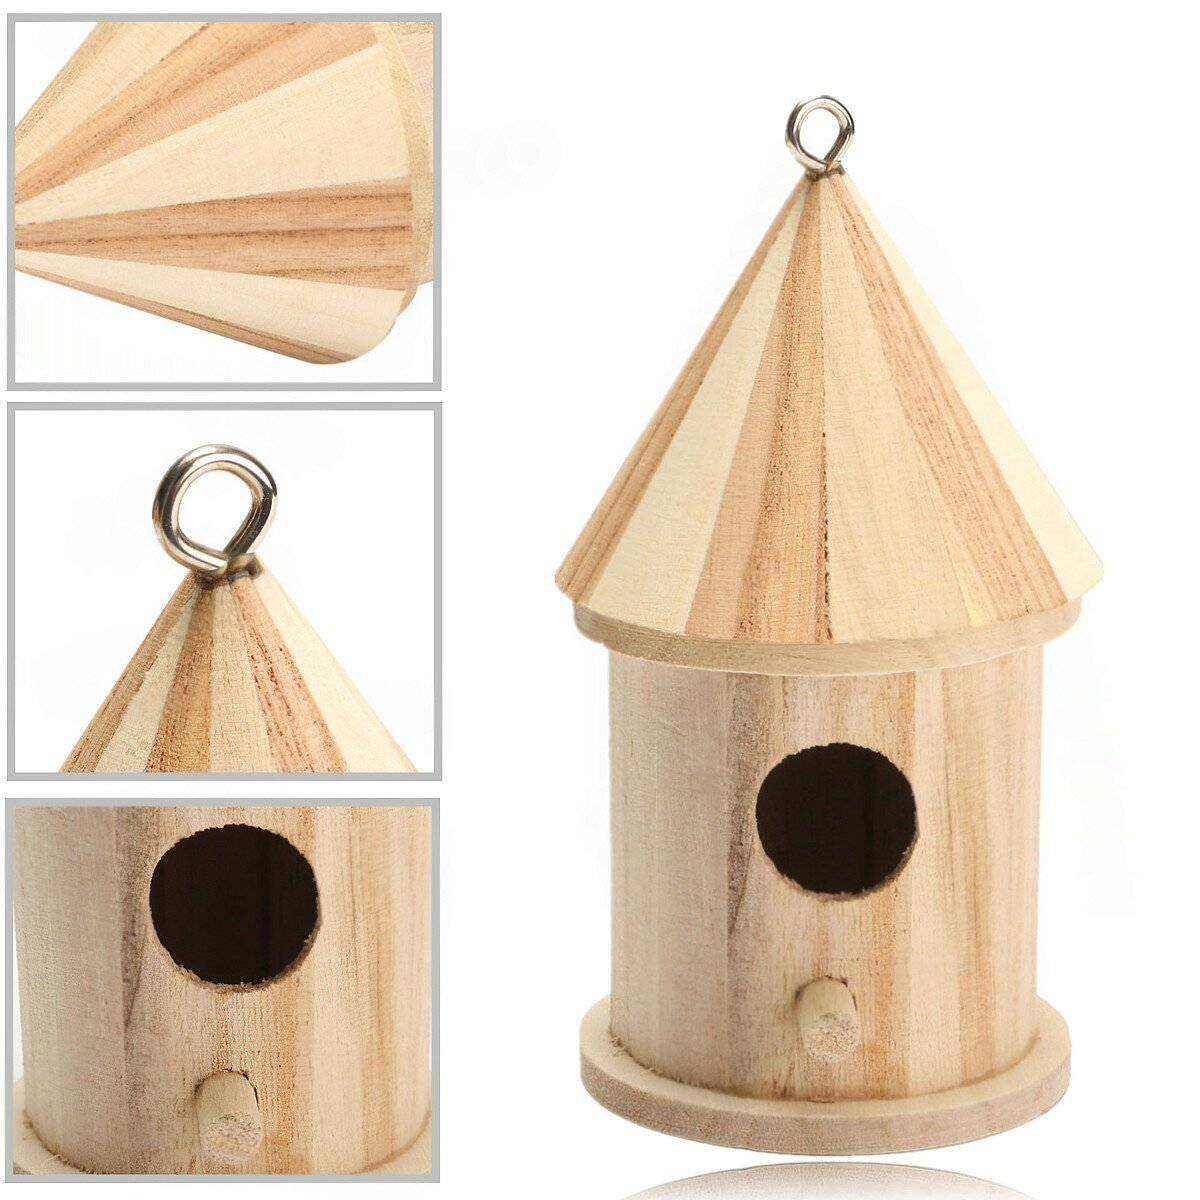 Khắc gỗ Birdhouse Bird Bird House Shed Garden Yard Treo Trang trí 16 x